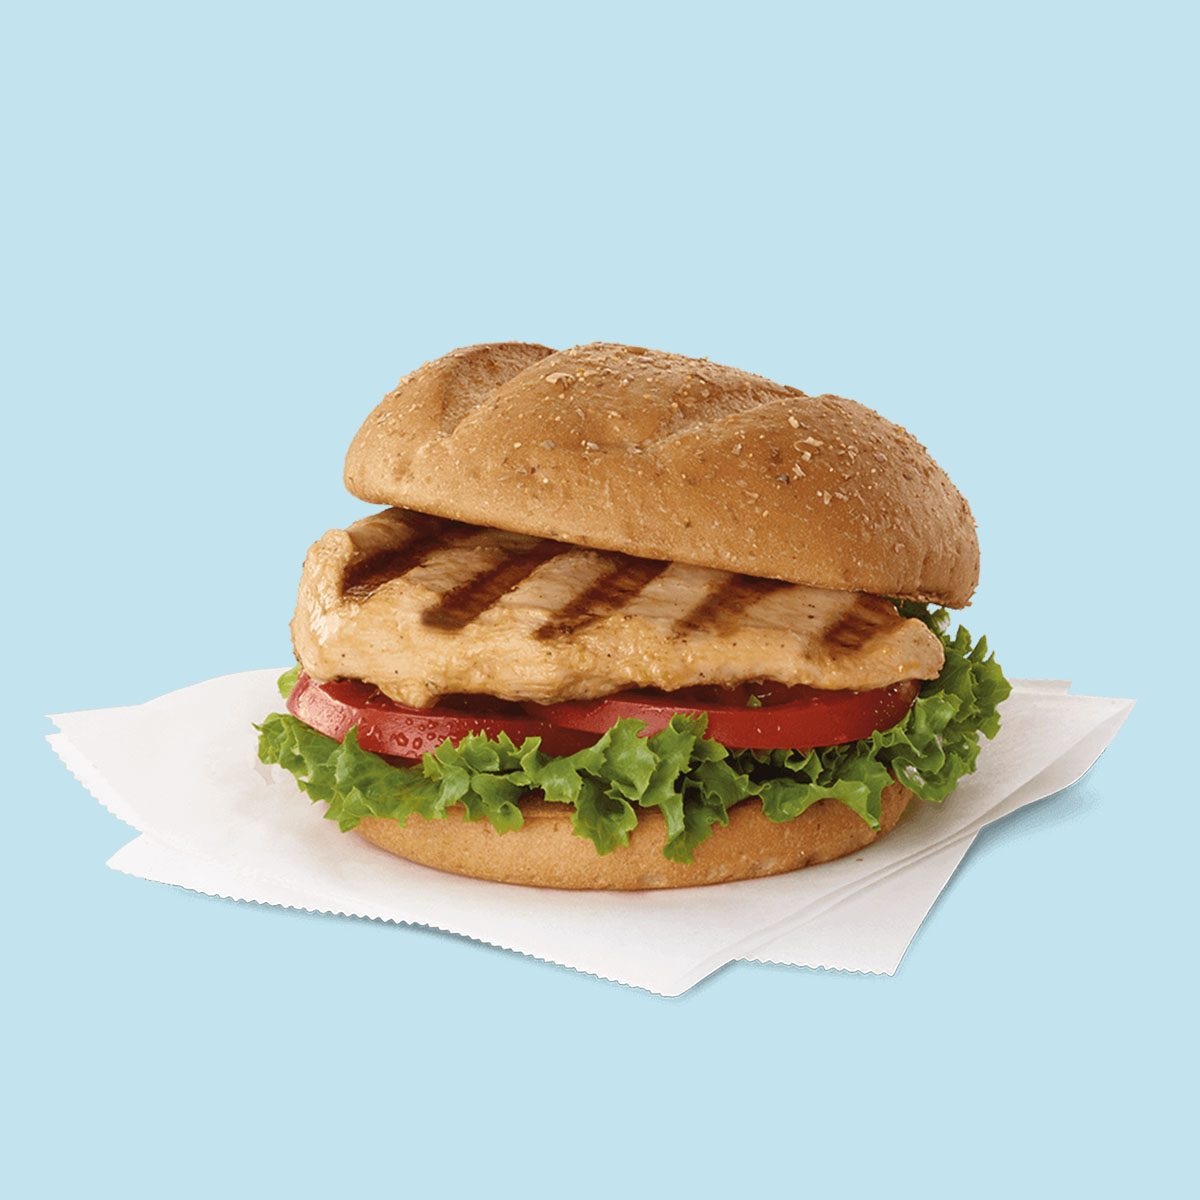 Chick-fil-A's Grilled Chicken Sandwich